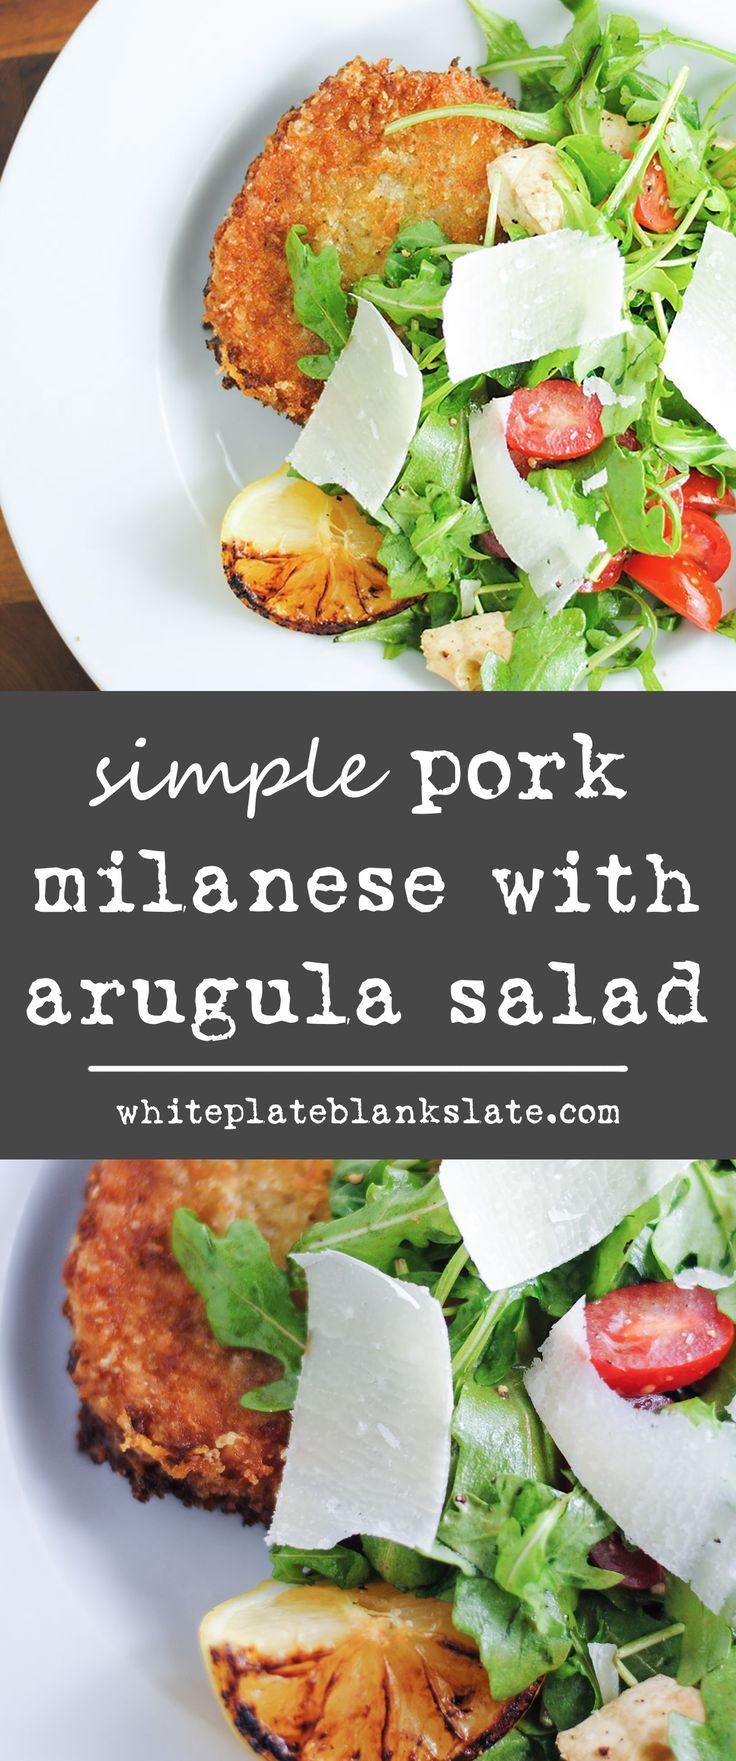 Simple pork Milanese with arugula, tomato and mozzarella salad.